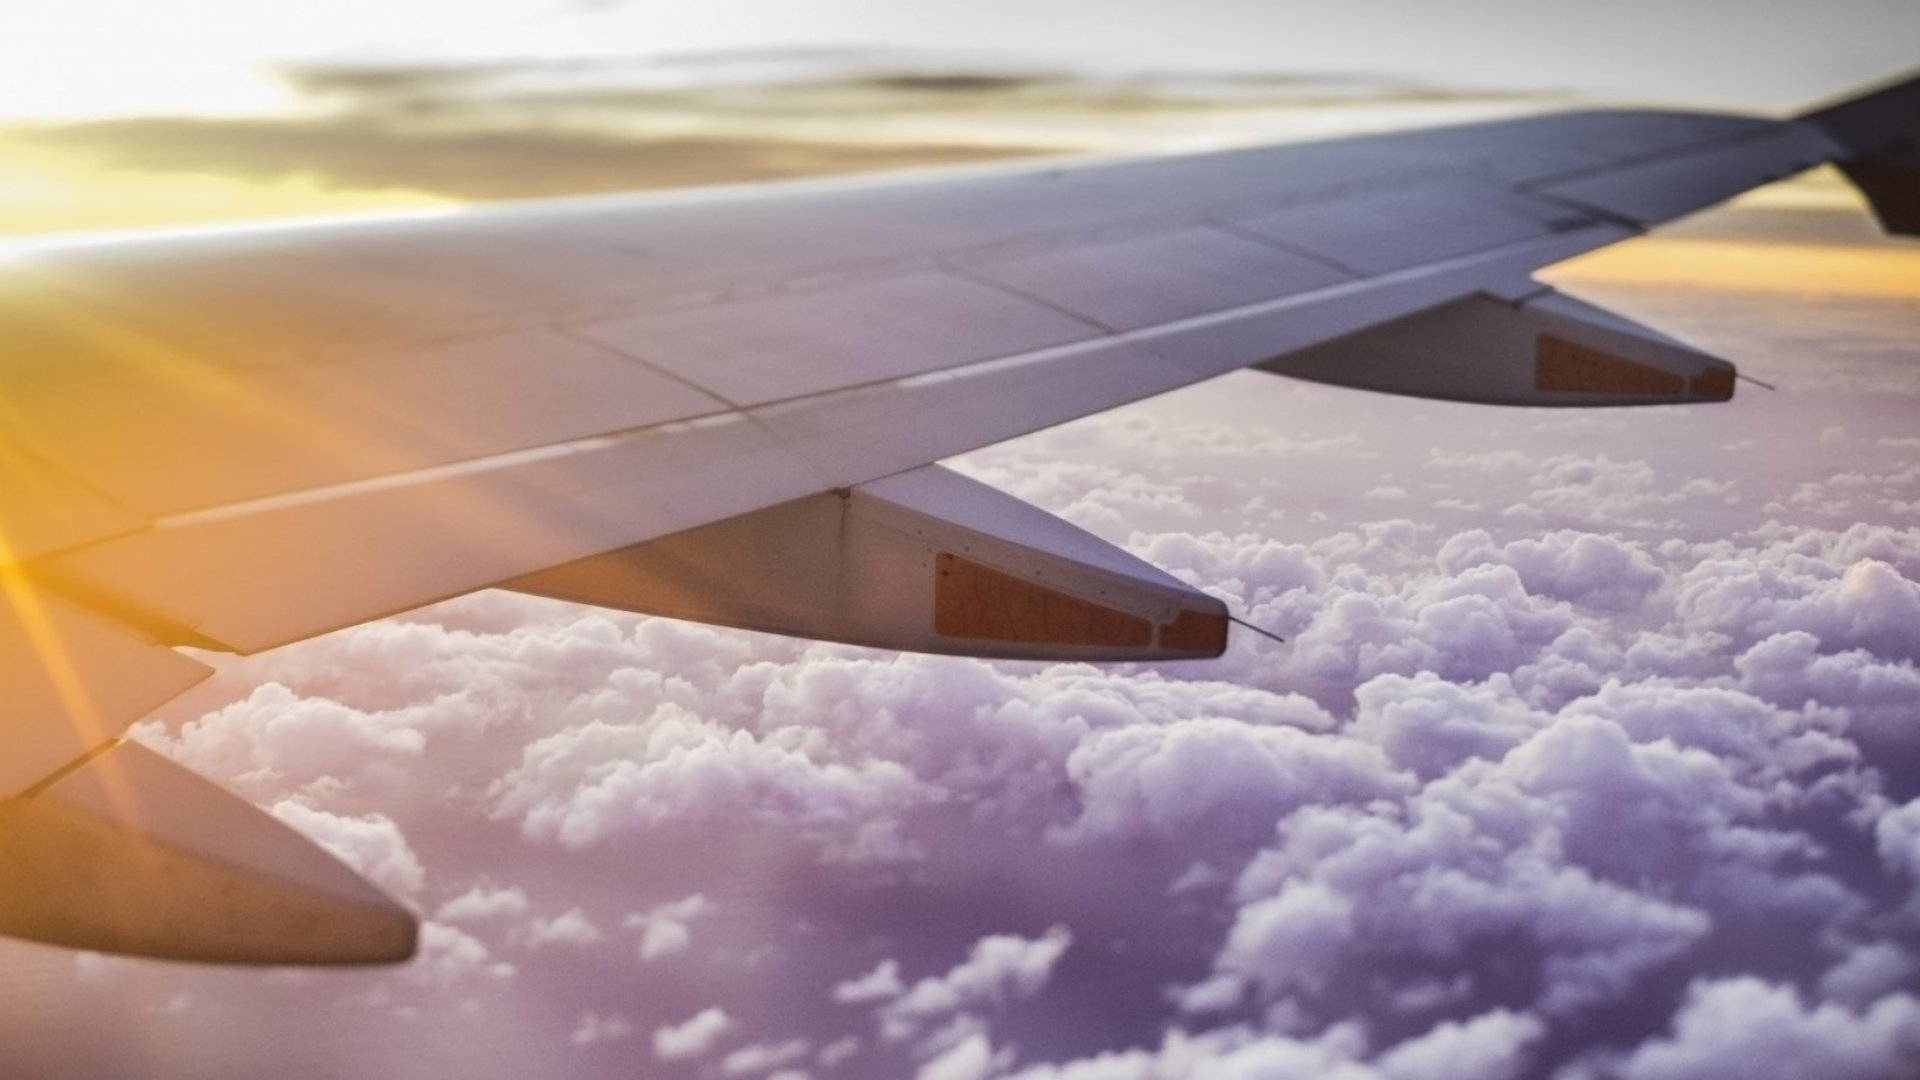 5 Fresh Ways to Beat Jet Lag, According to Science